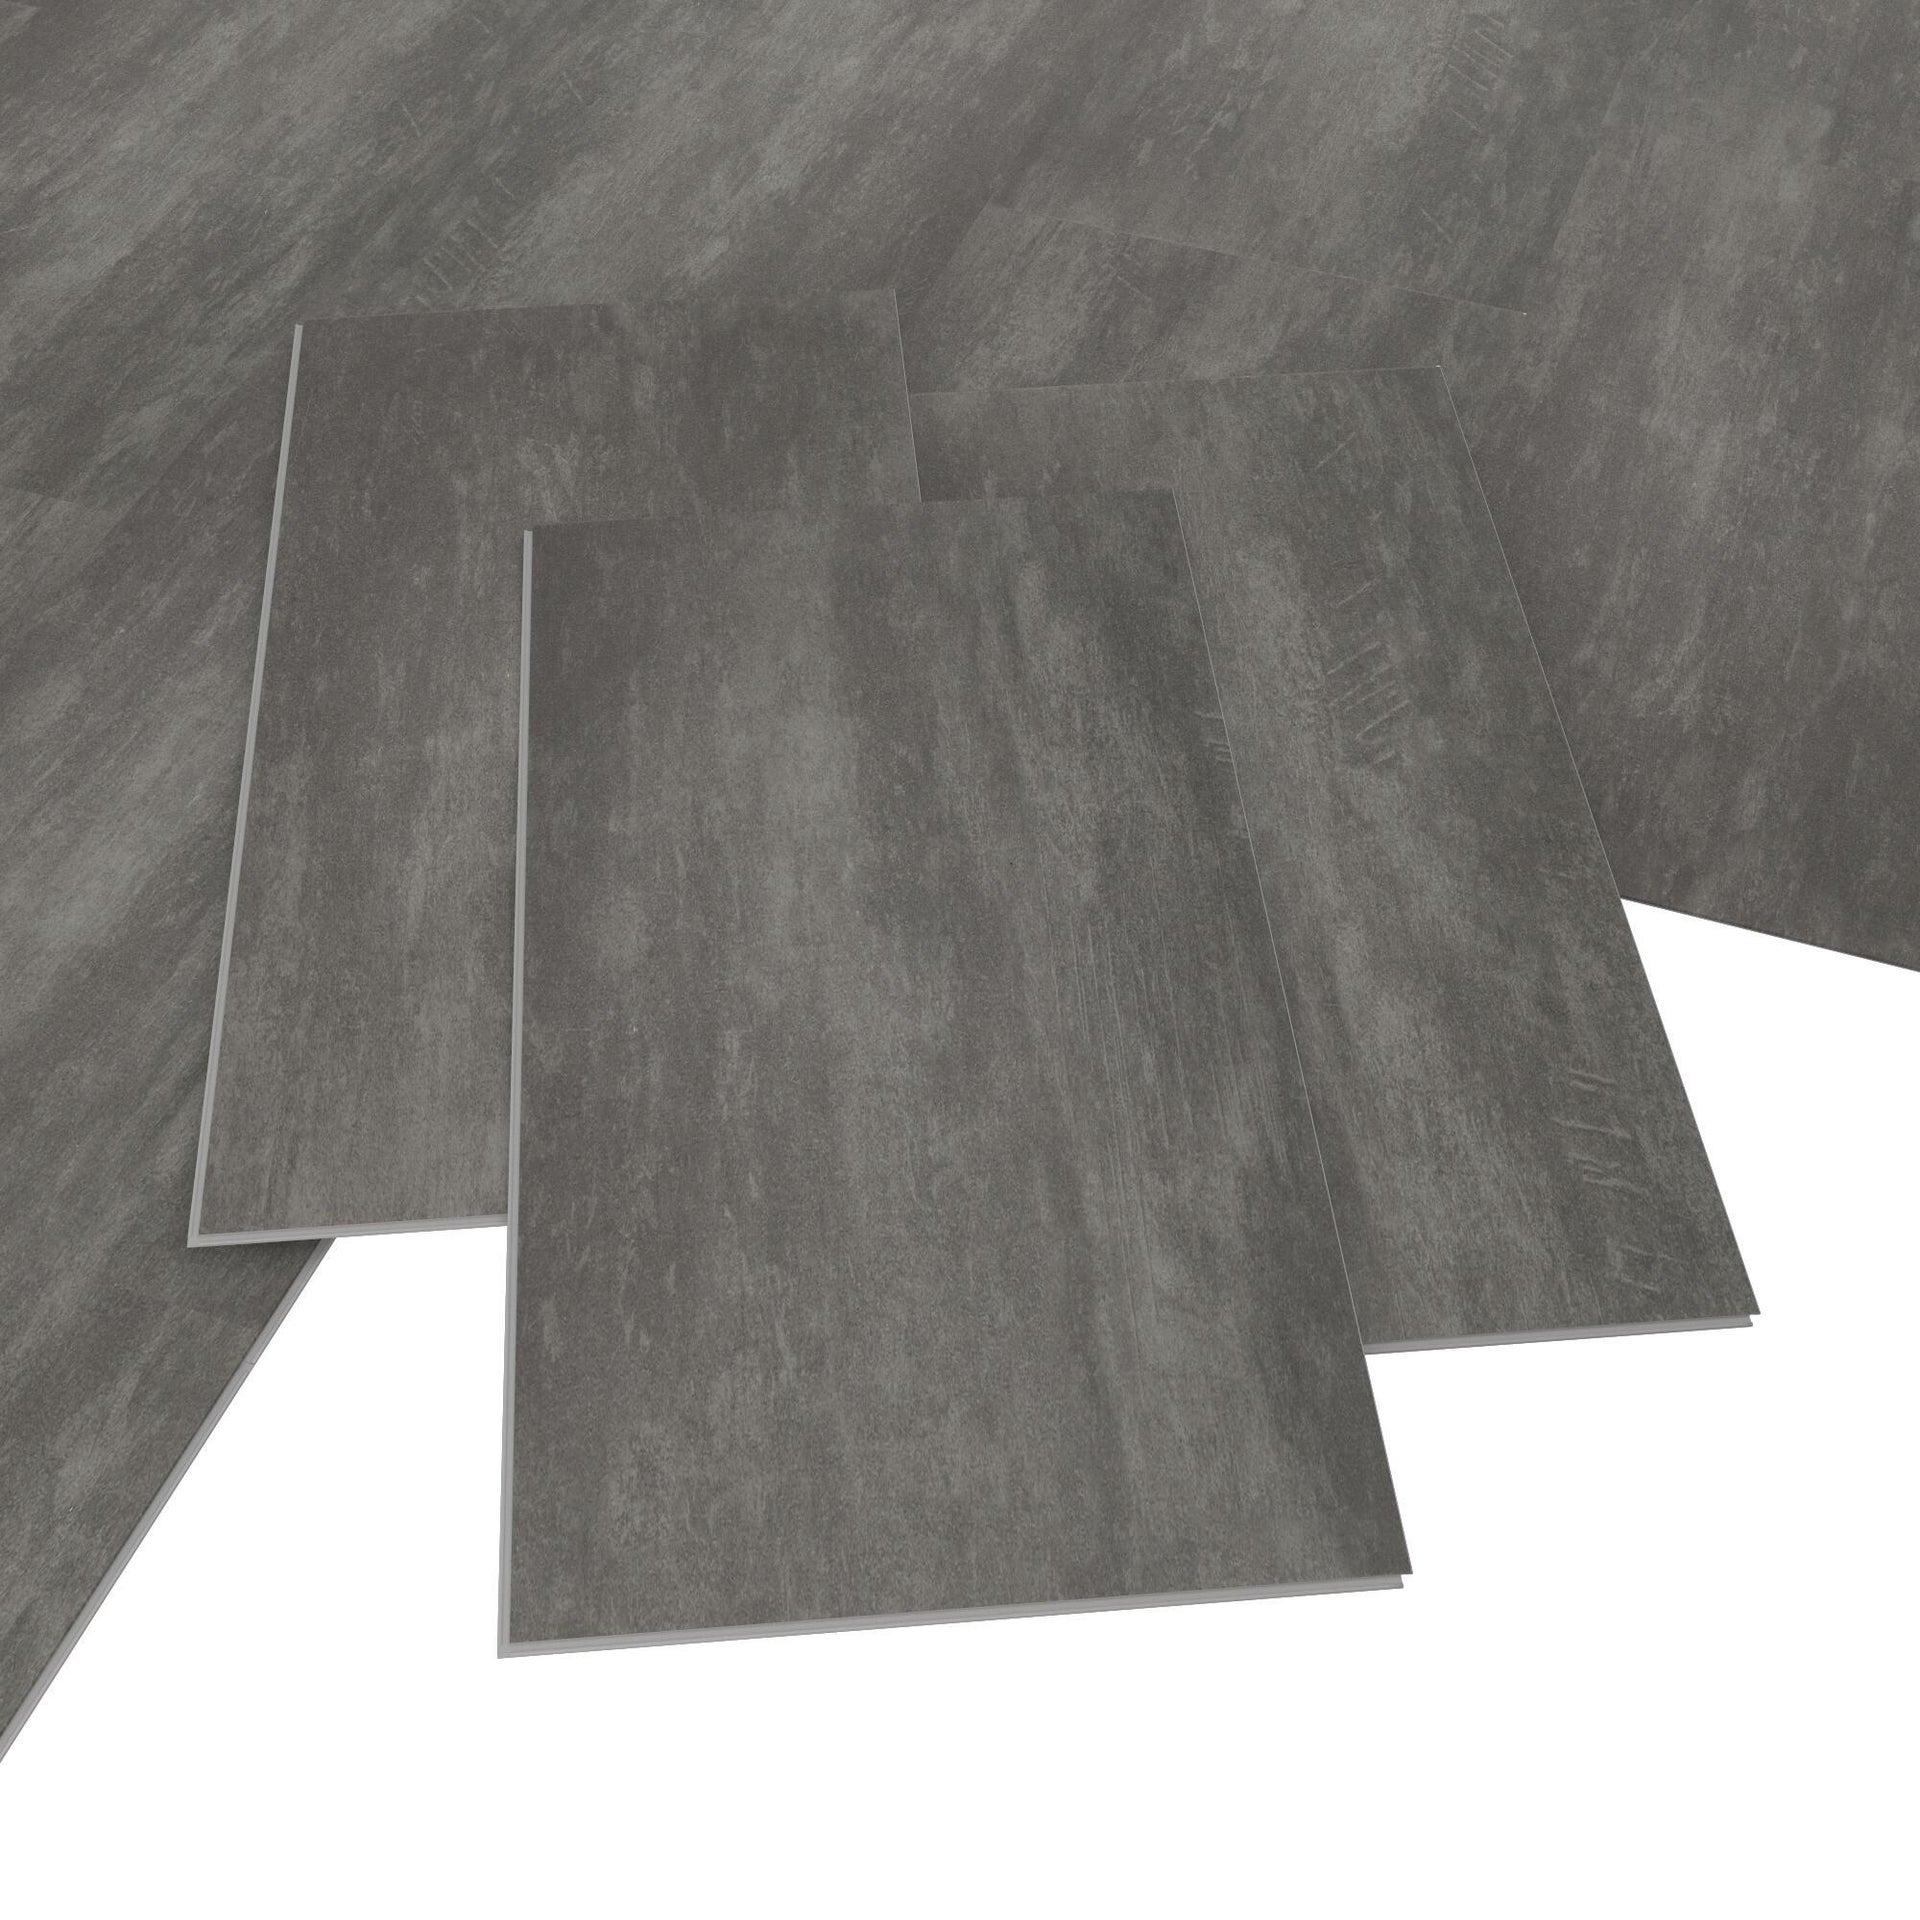 Pavimento PVC incastro Tolu Sp 4 mm grigio / argento - 11